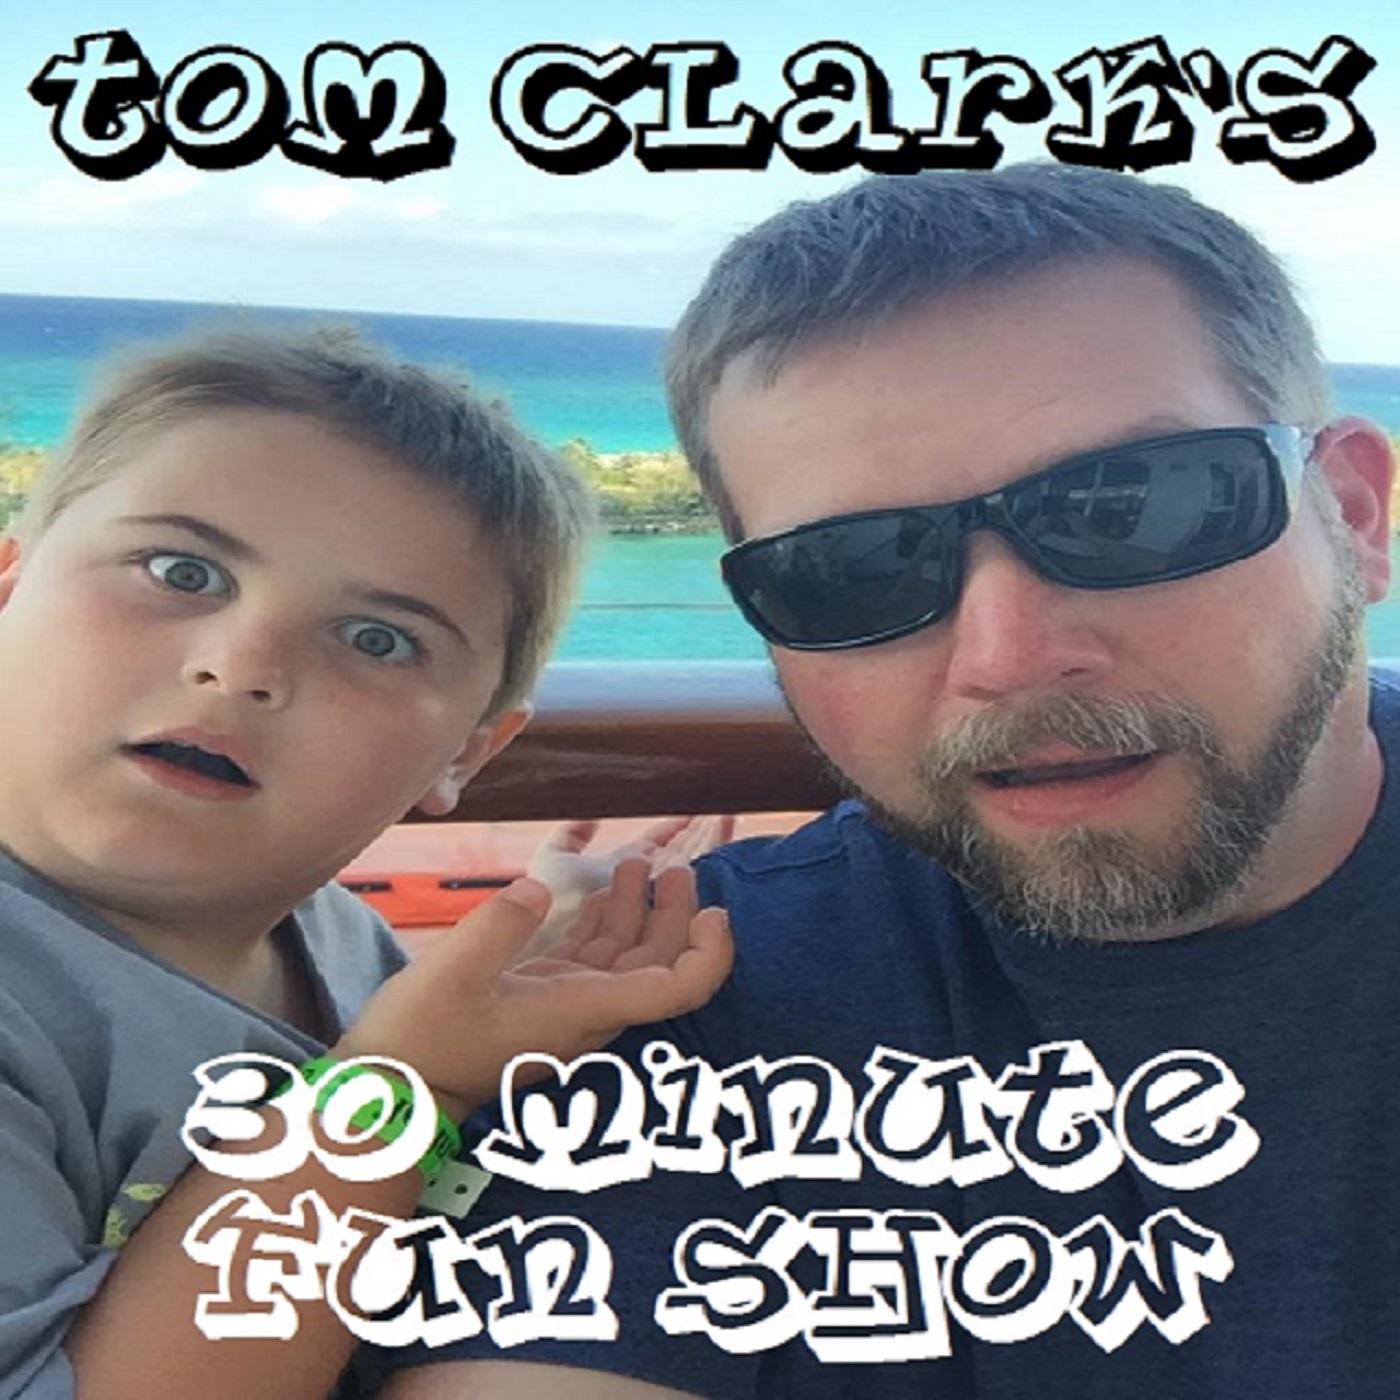 Tom Clark's 30 Minute Fun Show show art